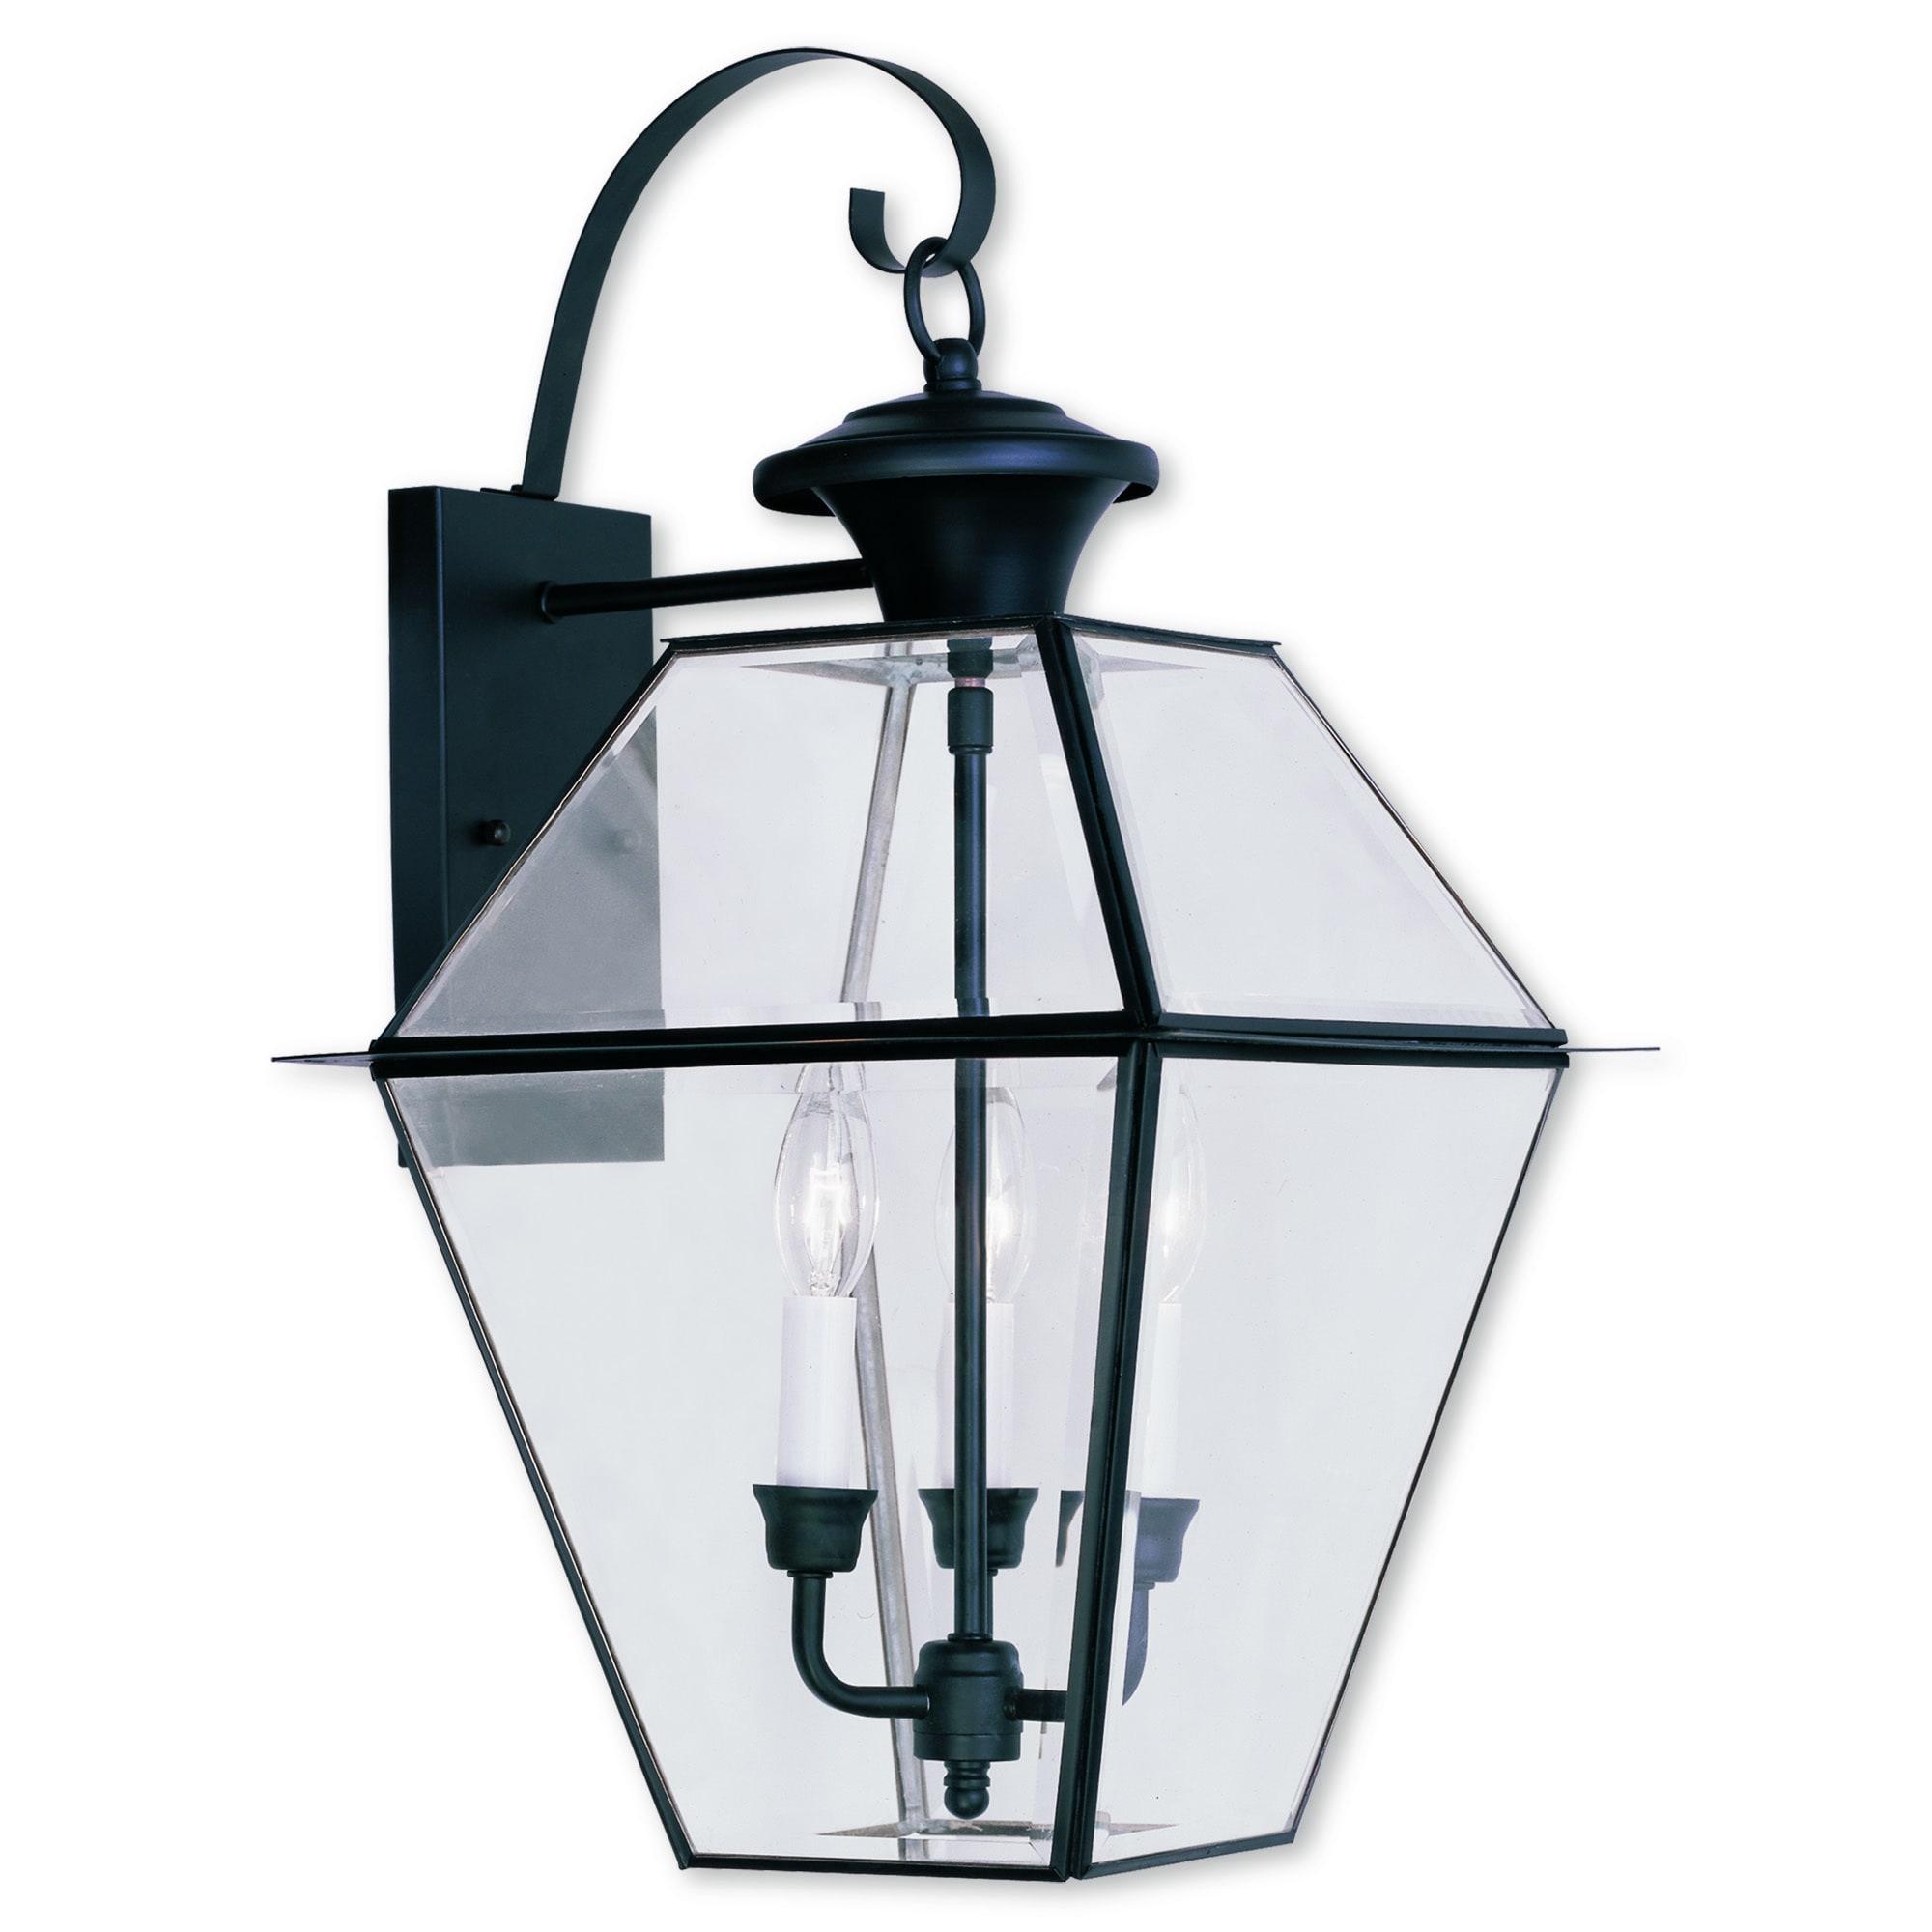 Progress Lighting Onion Lantern 3-Light Outdoor Textured Black Wall Lantern